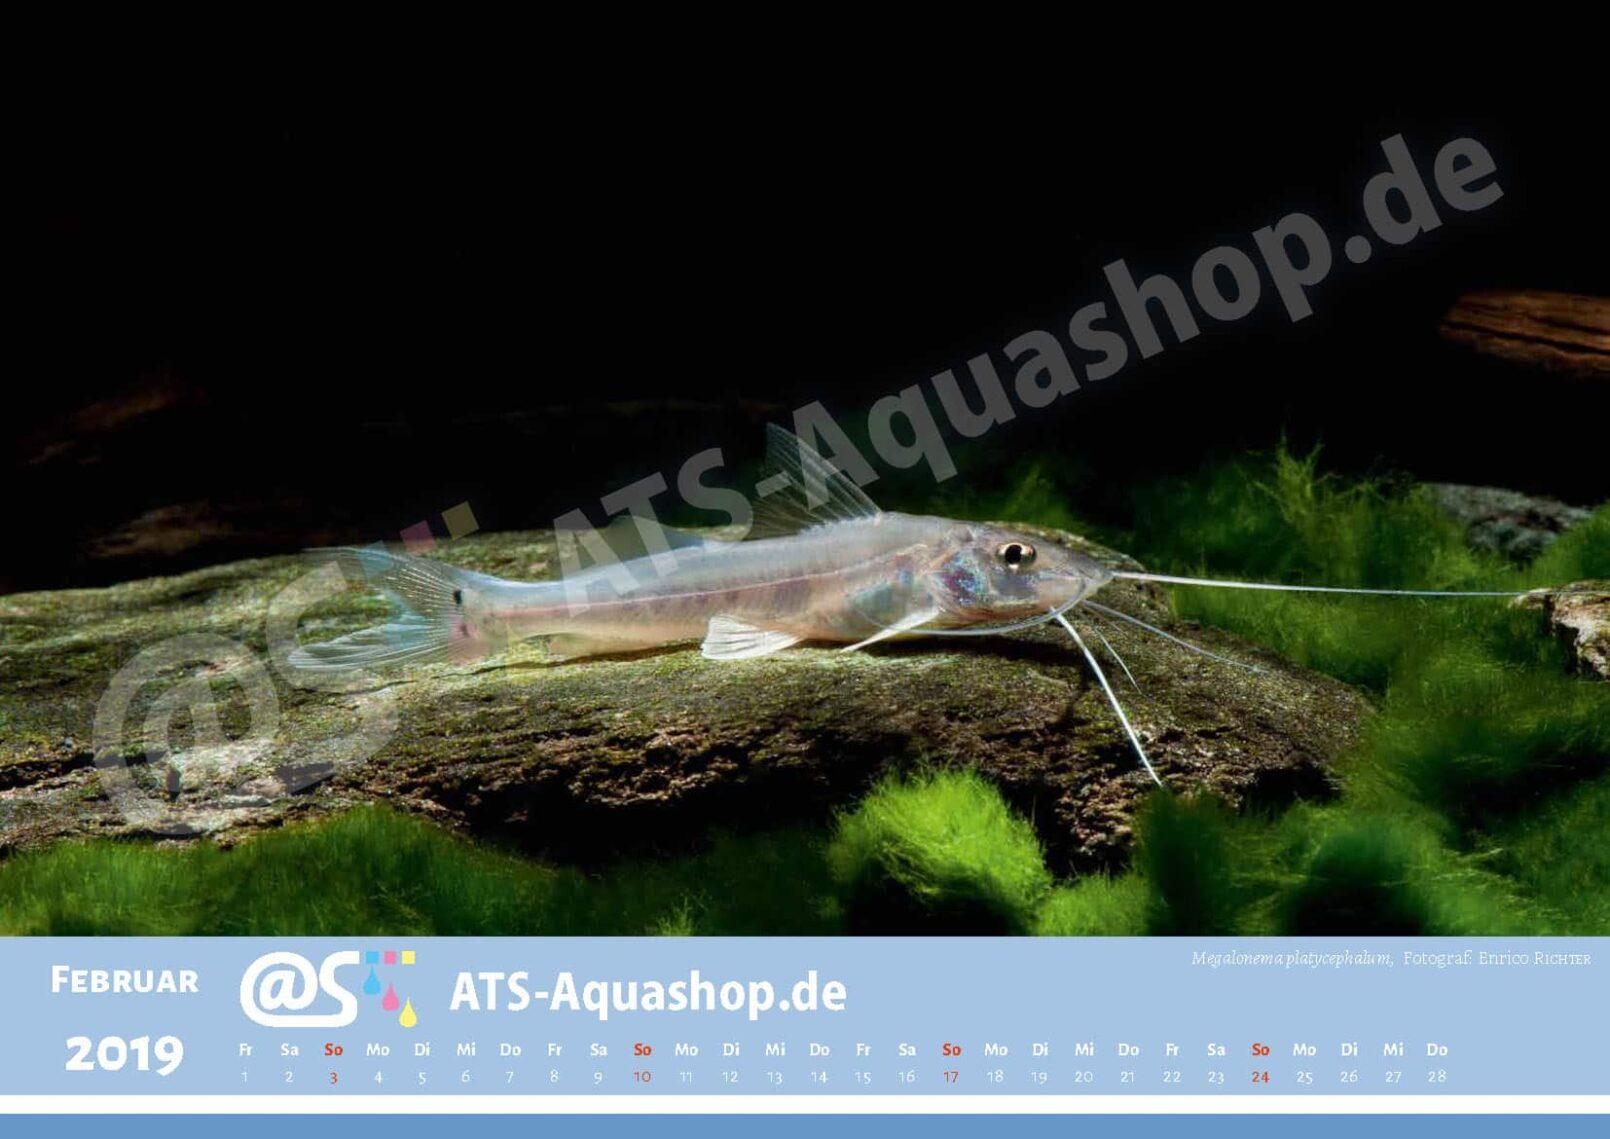 Foto Jahreskalender 2019 DIN A3: Megalonema platycephalum